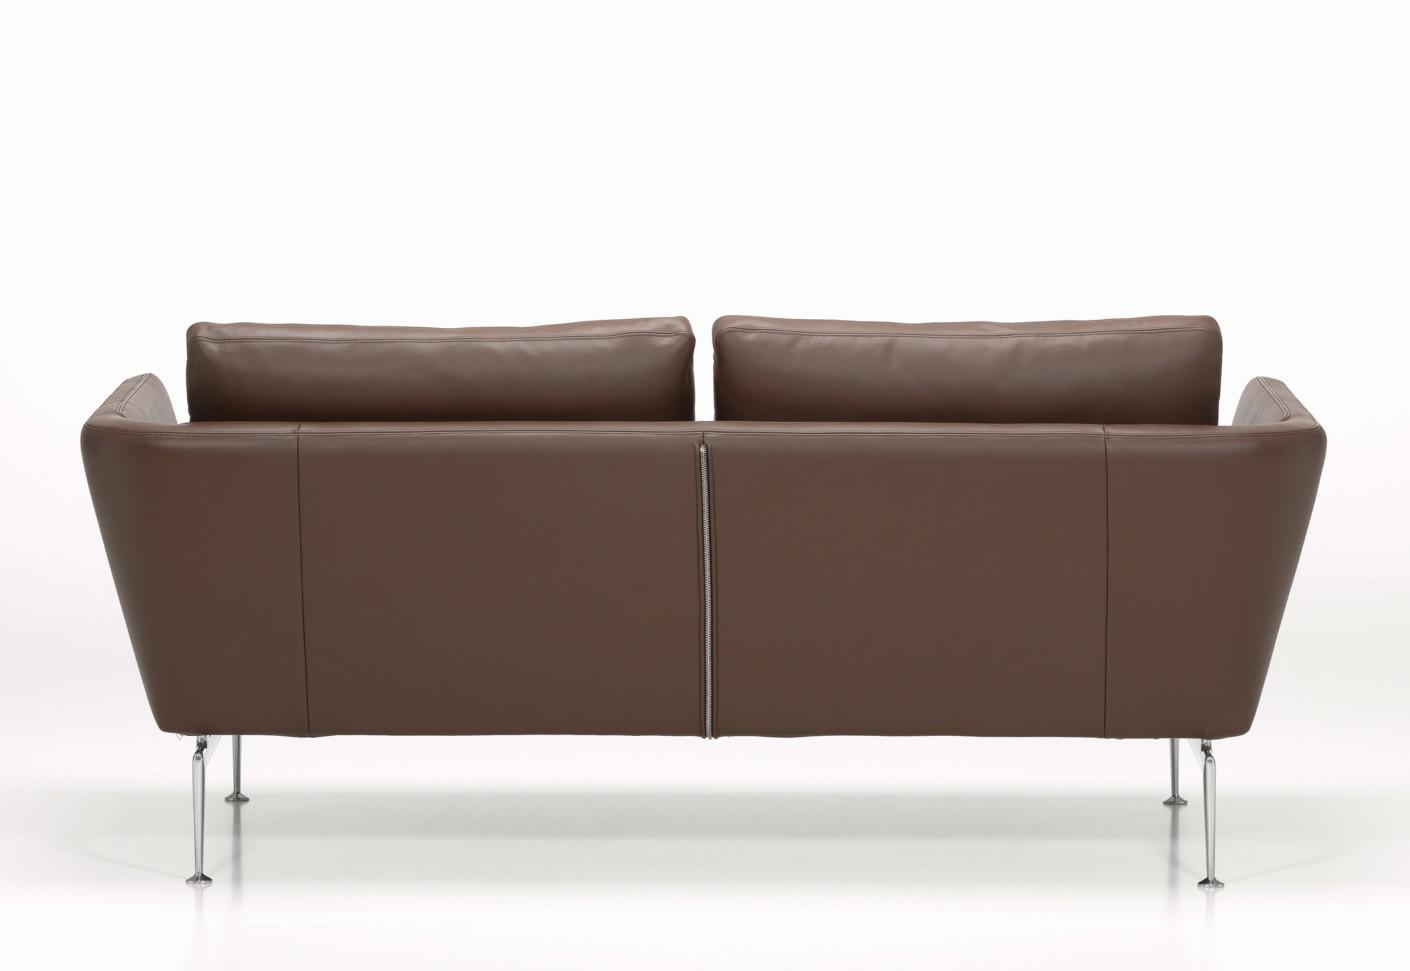 Suita Sofa By Vitra STYLEPARK